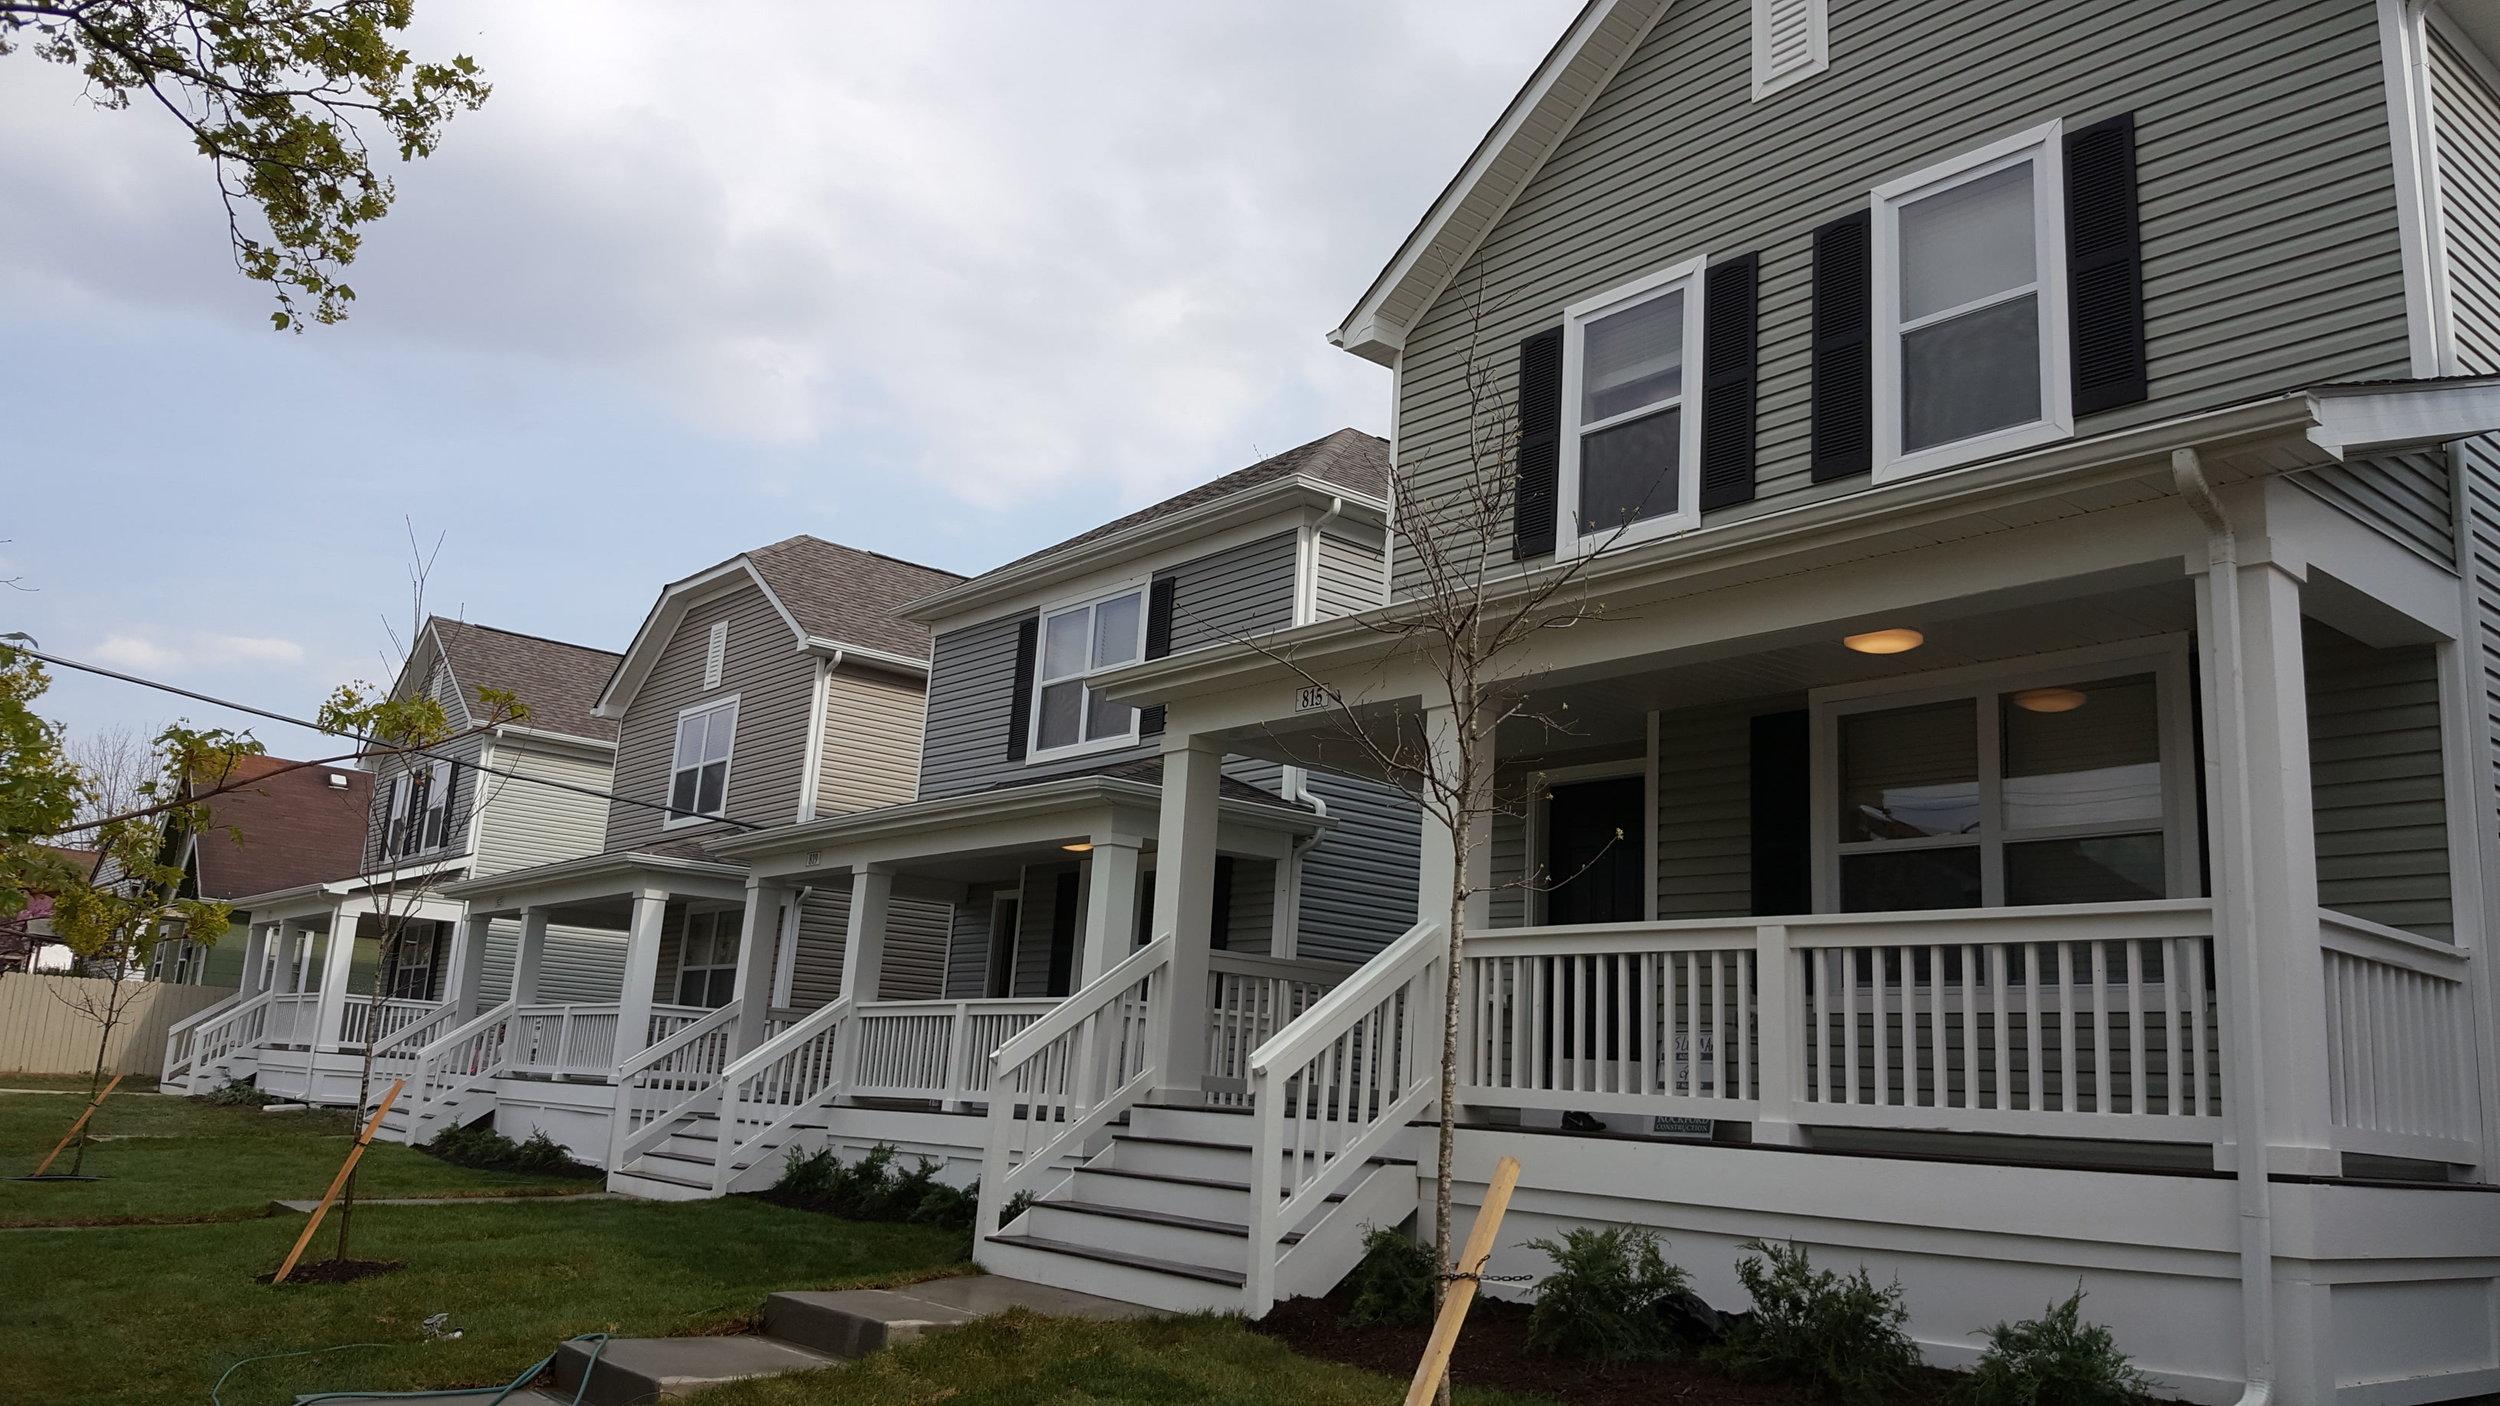 Homes built by Homeport in 2018 in Milo-Grogan